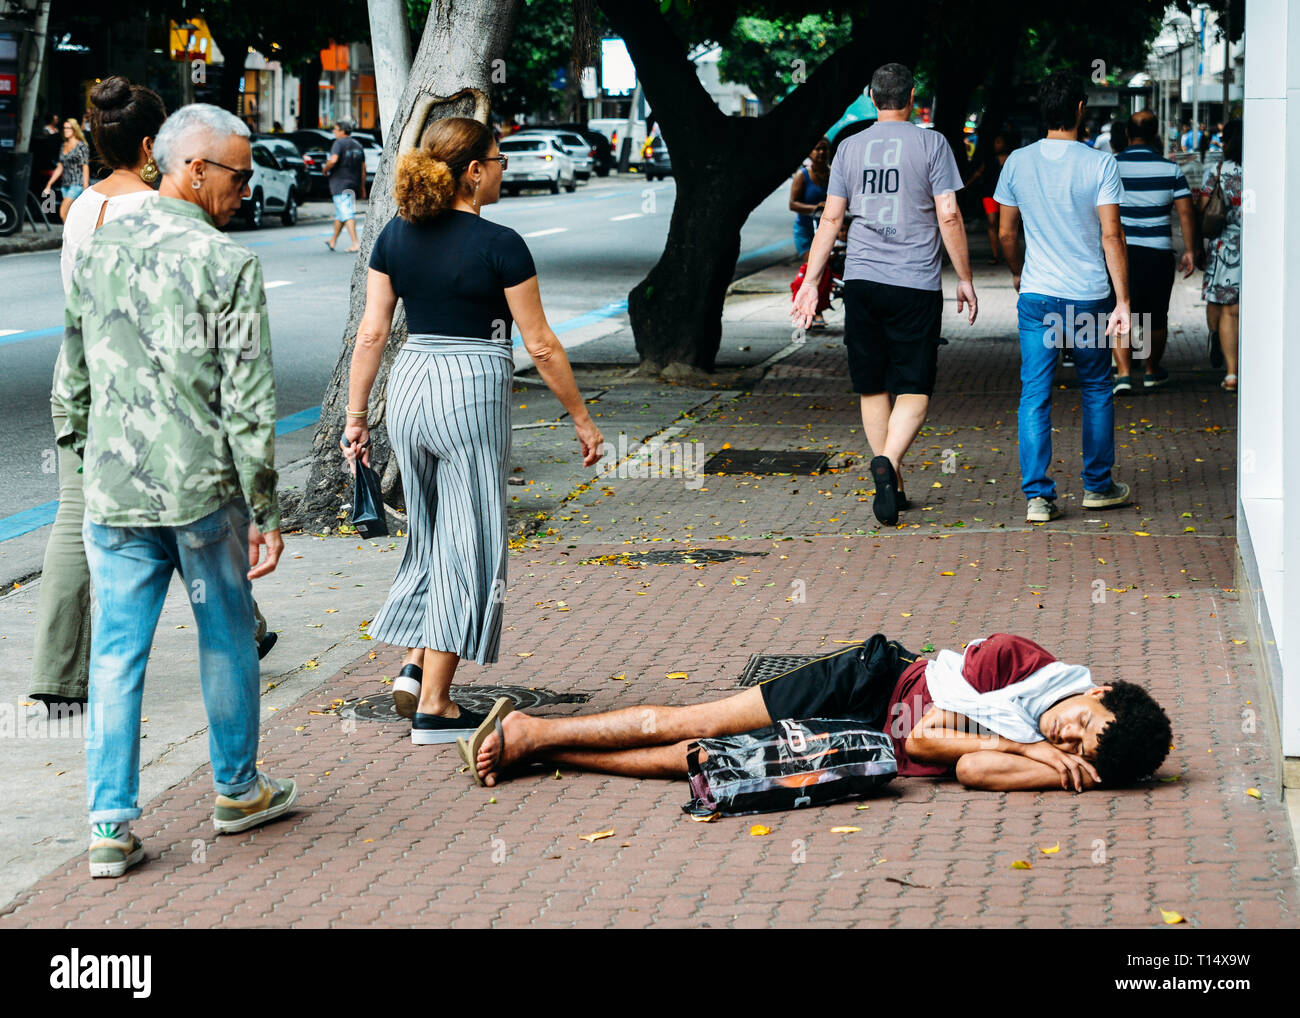 rio-de-janeiro-brazil-march-23-2019-homeless-young-man-sleeping-rough-while-pedestrians-walk-next-to-him-on-busy-pedestrian-sidewalk-in-the-wealth-T14X9W.jpg